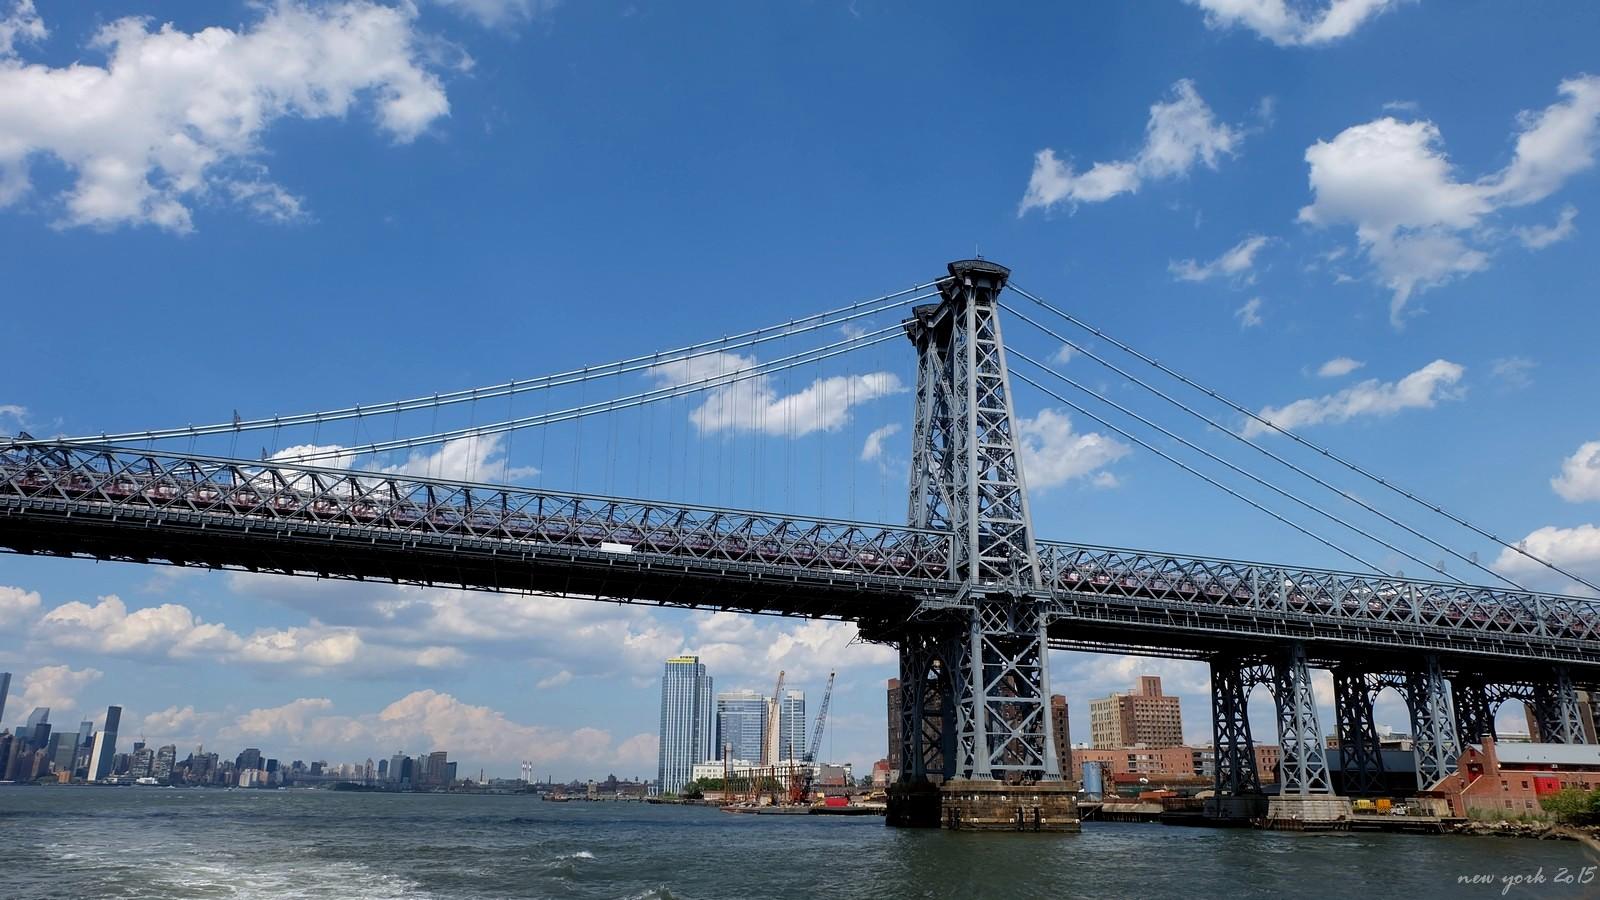 Williamsburg Bridge, New York City, USA